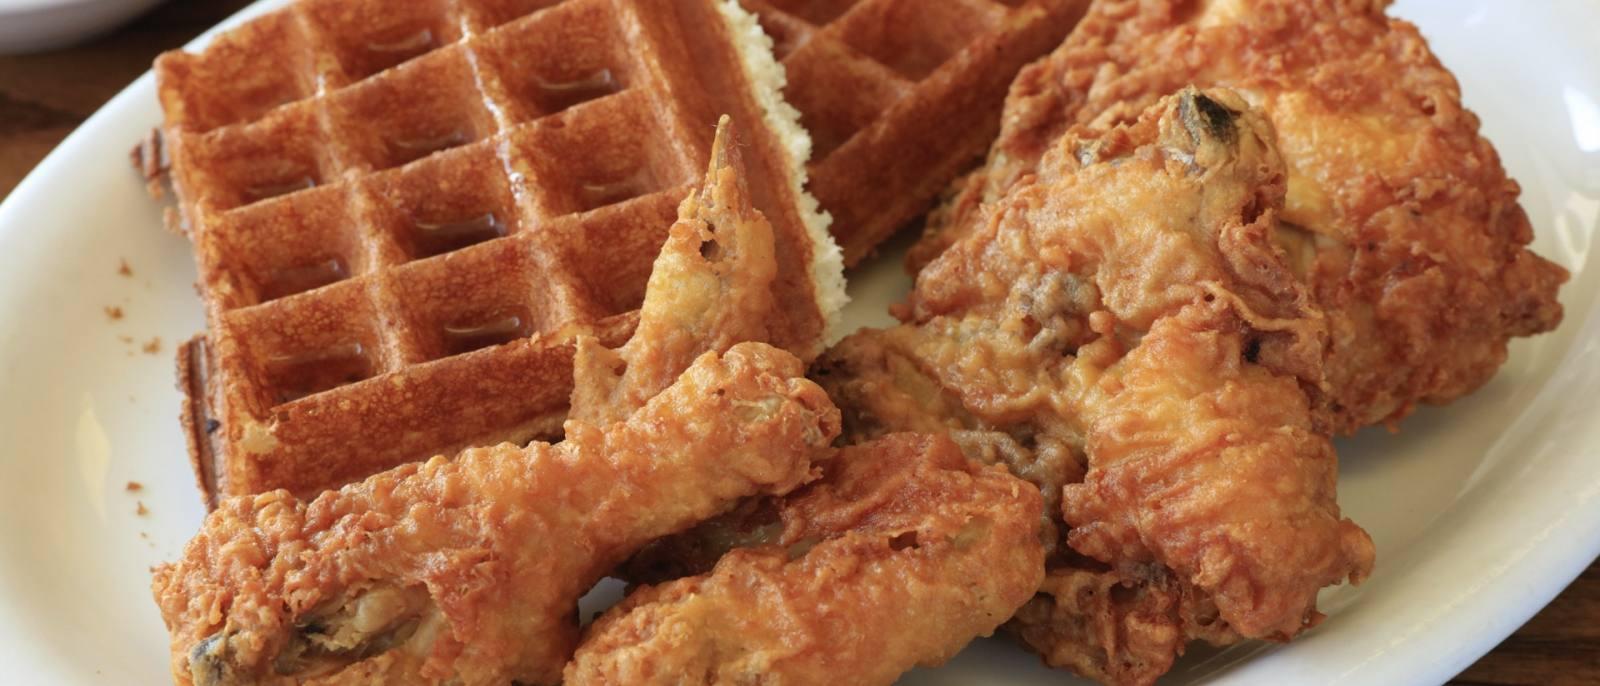 Chicken and Waffles at the Hungry Fox   |  Photo: Yuri Hasegawa